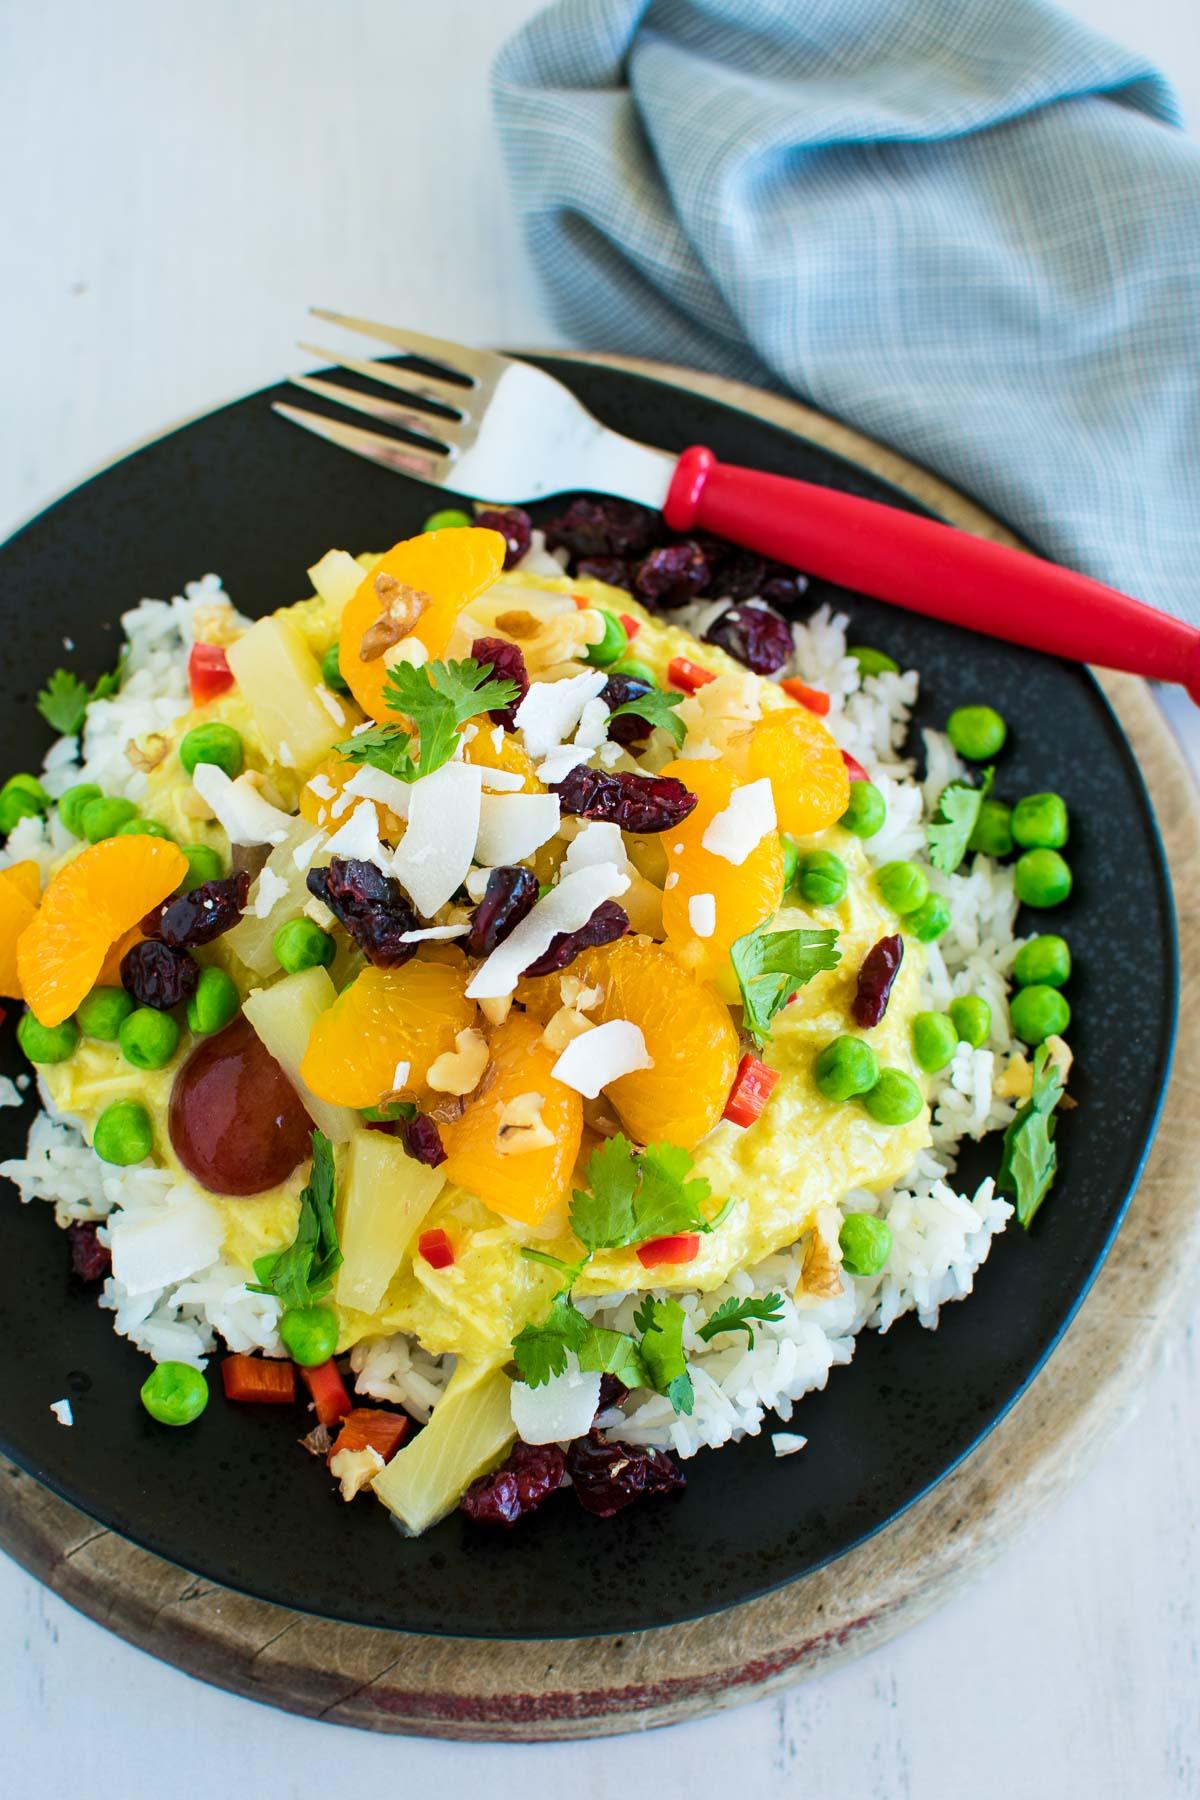 Hawaiian Haystacks recipe with curry, fruit, and veggies like pineapple.